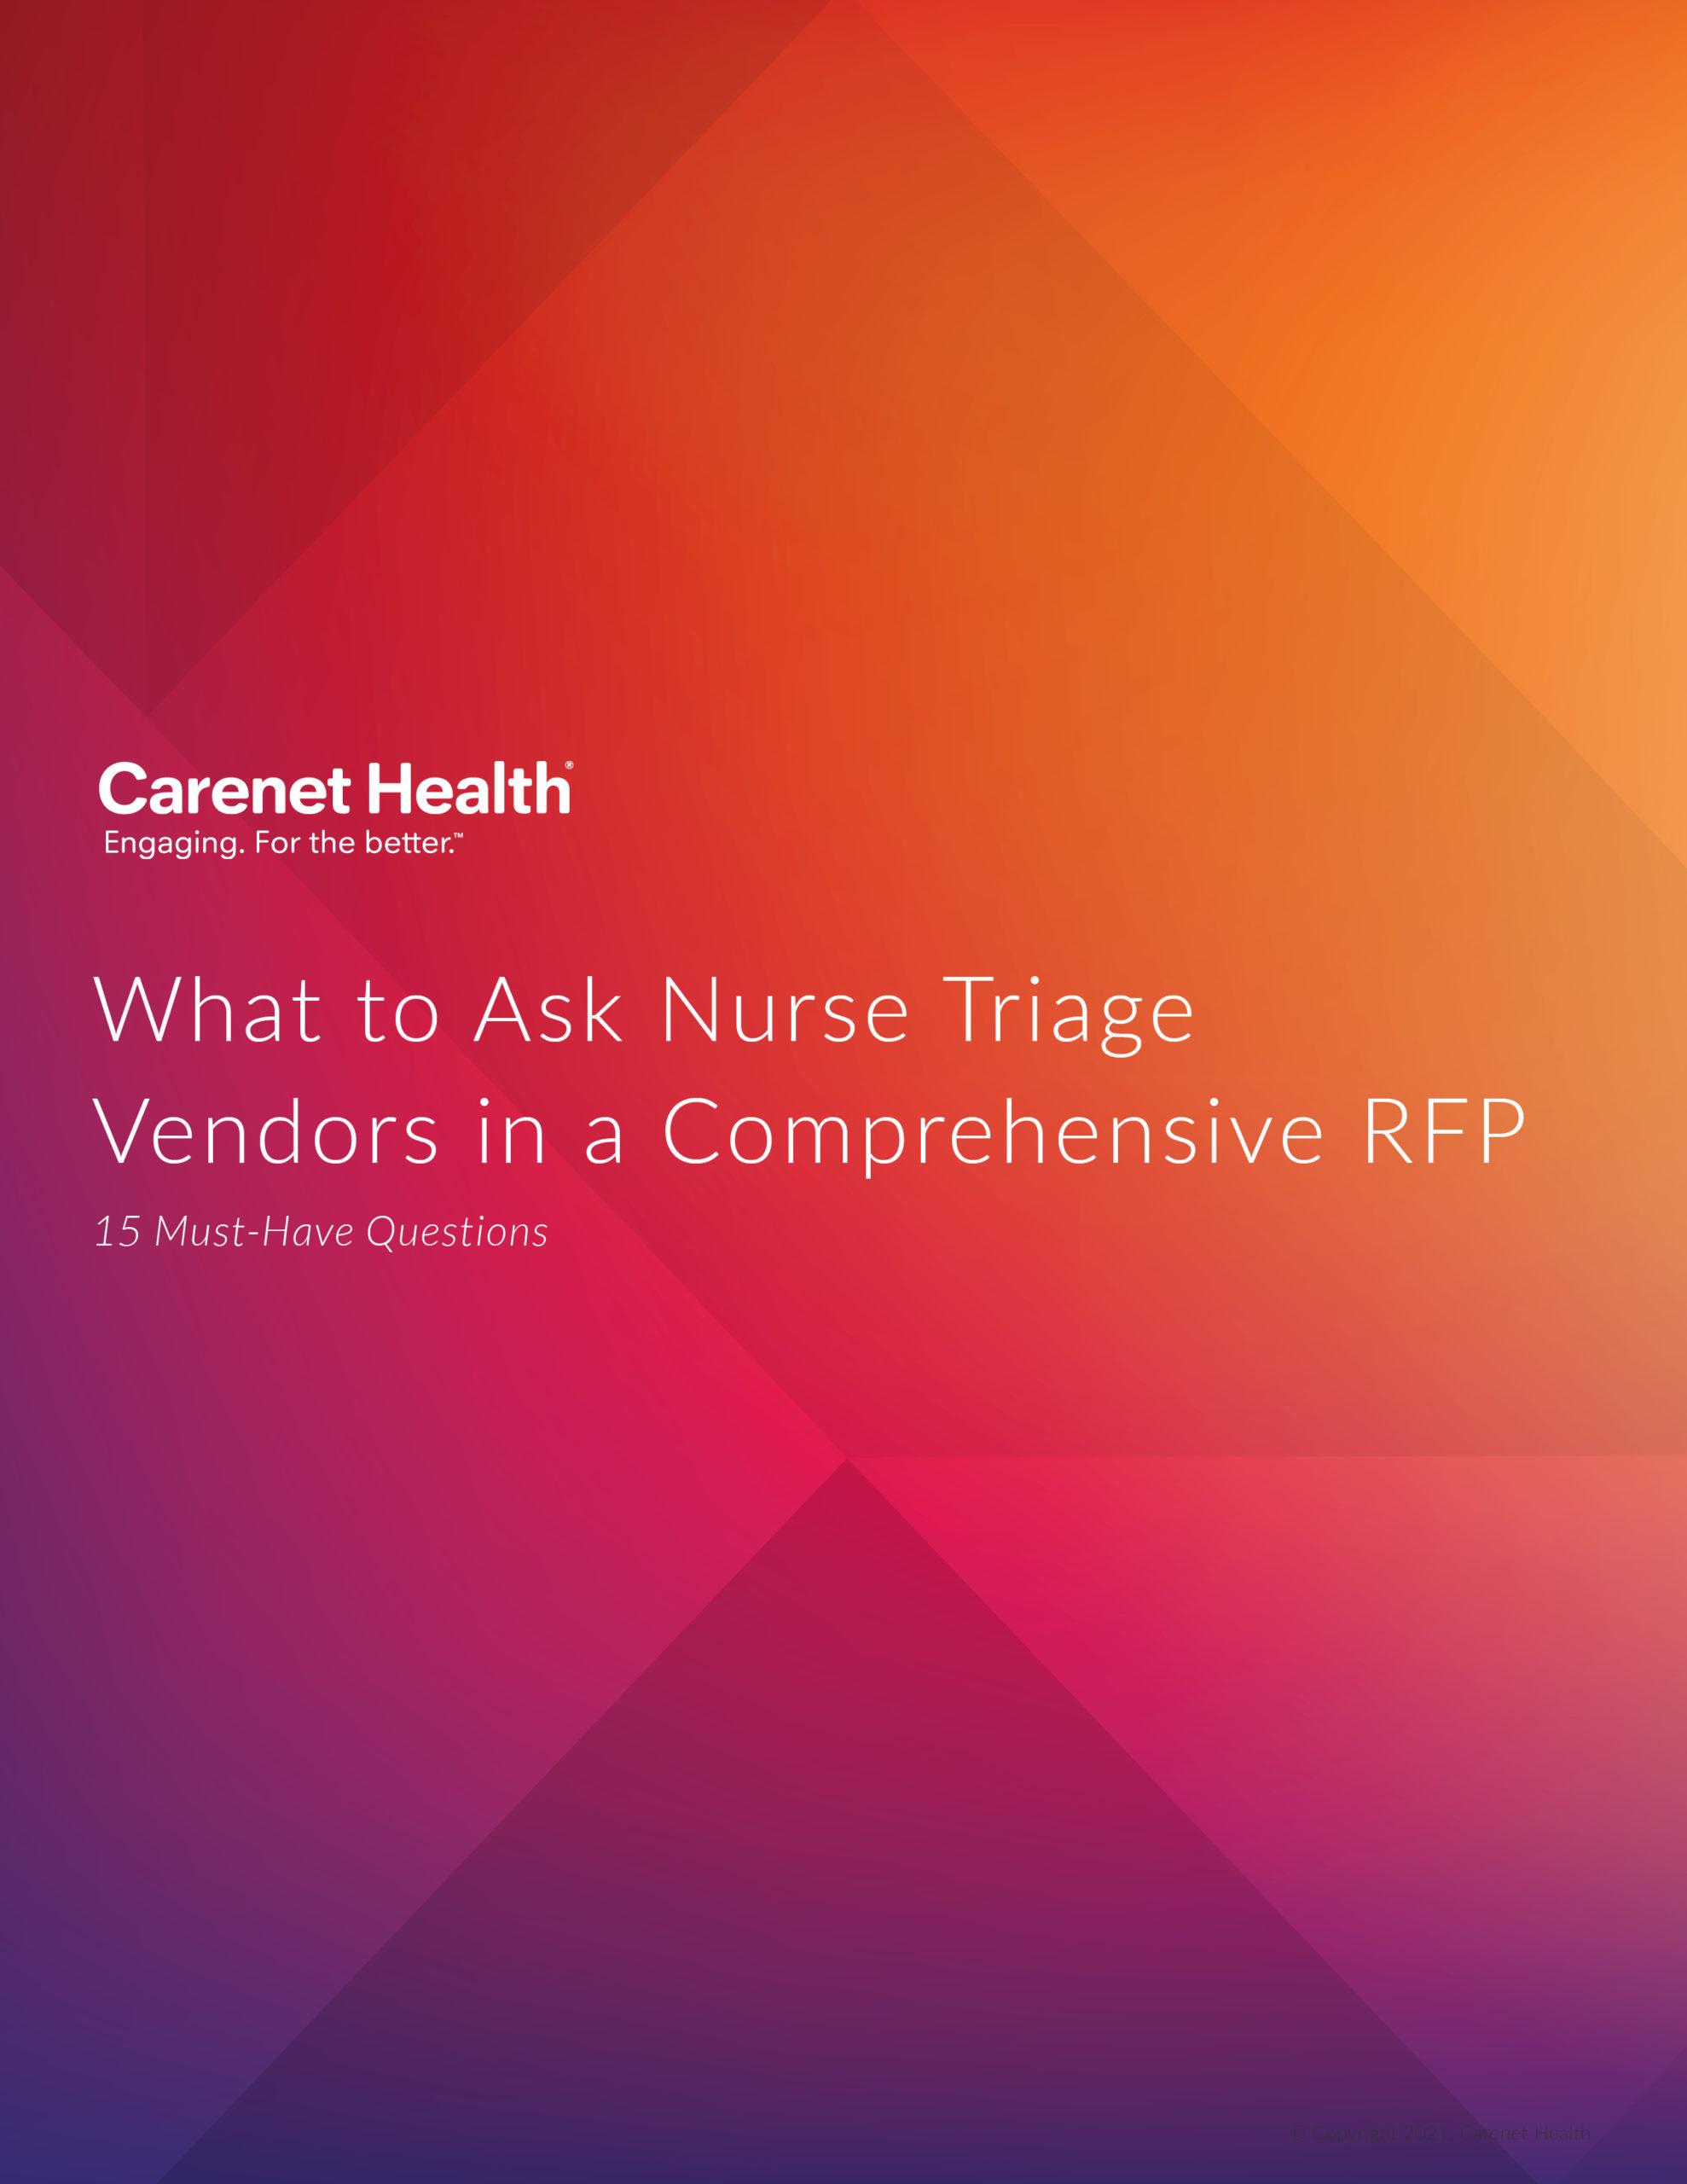 Nurse Triage RFP